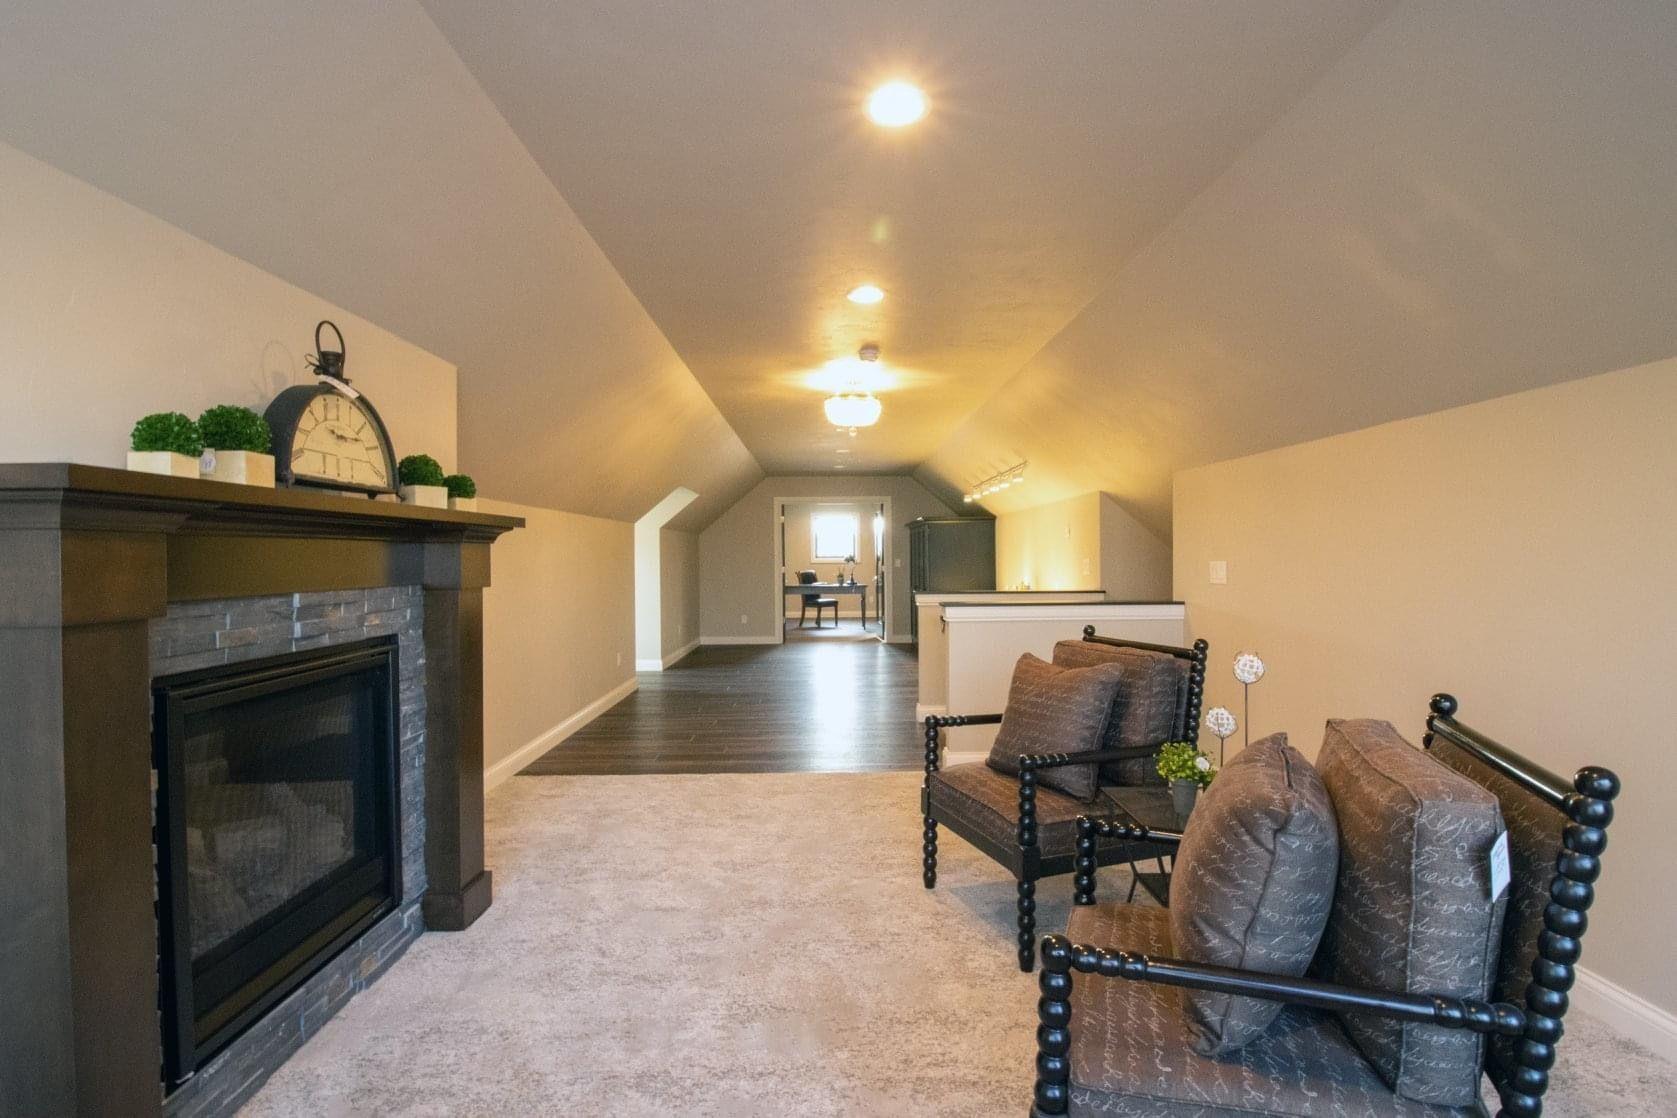 #bonusroom #homeoffice #abovegarage #studiospace #familyspace #interiordesign #homebuilder #colorcabinet #bluecabine #fireplace #hardwoodfloors #newbuild #designideas #finishwork